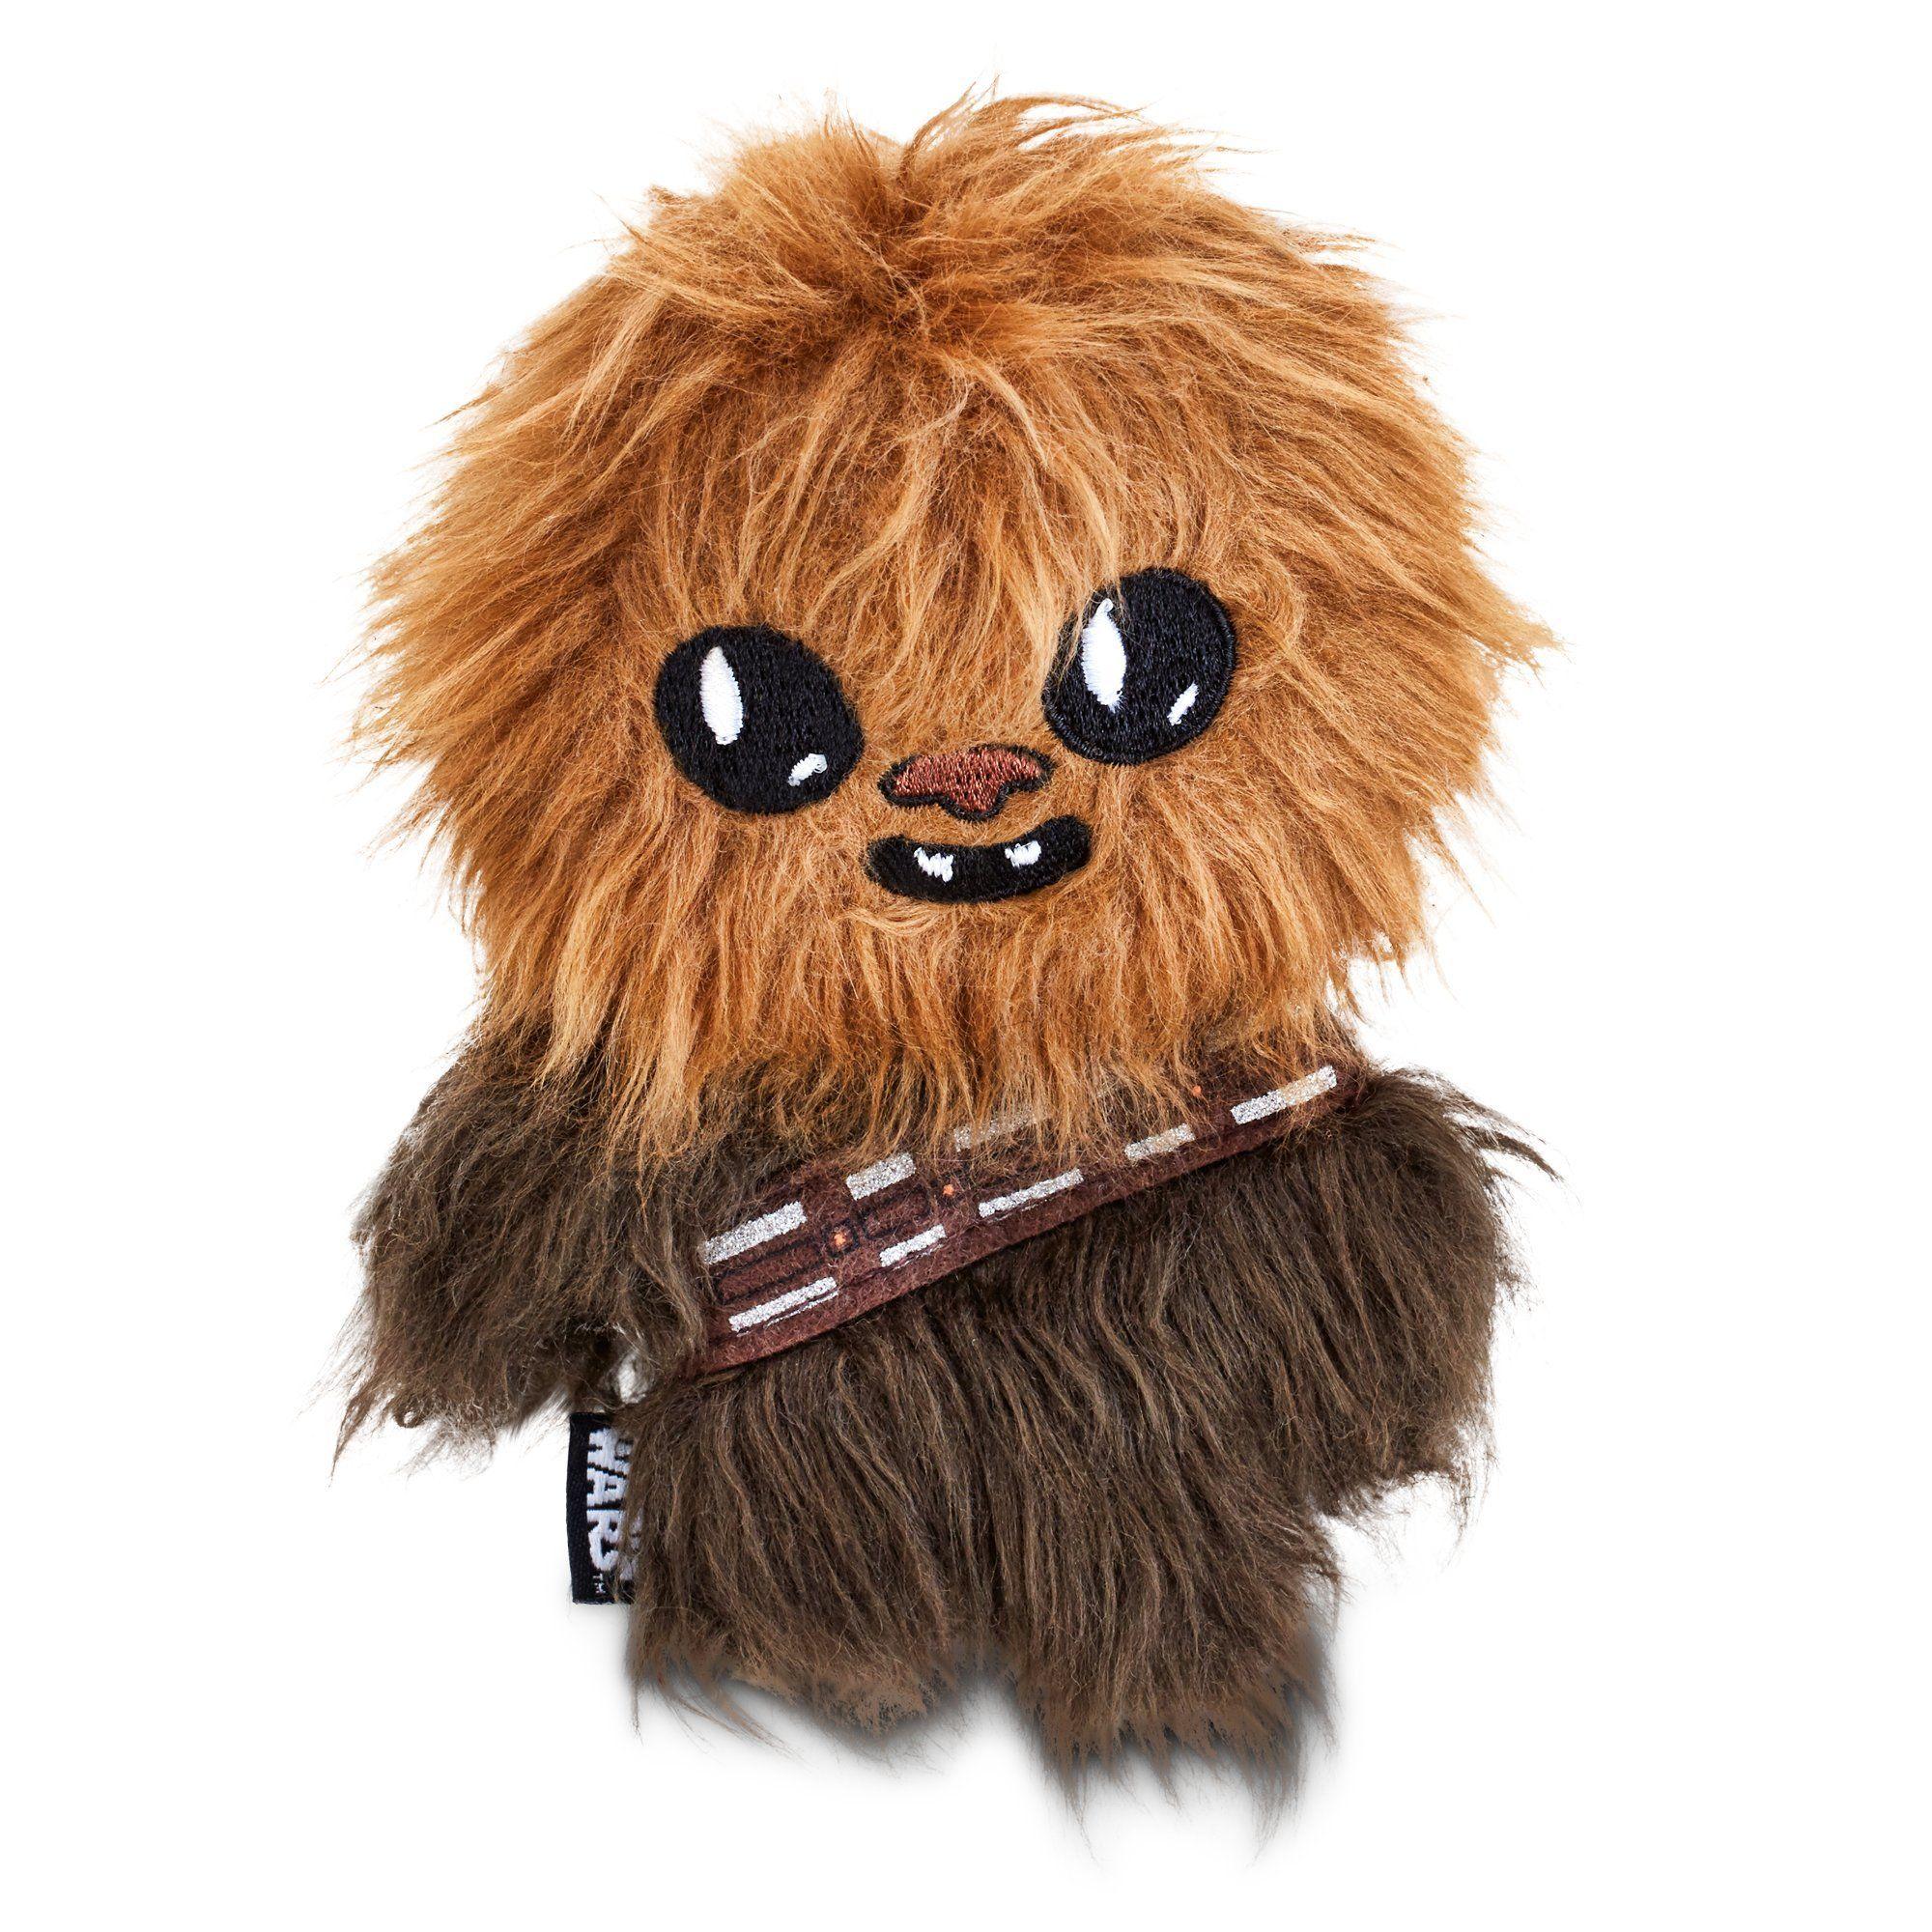 STAR WARS Chewbacca Flattie Dog Toy 6 L by Petco ** See